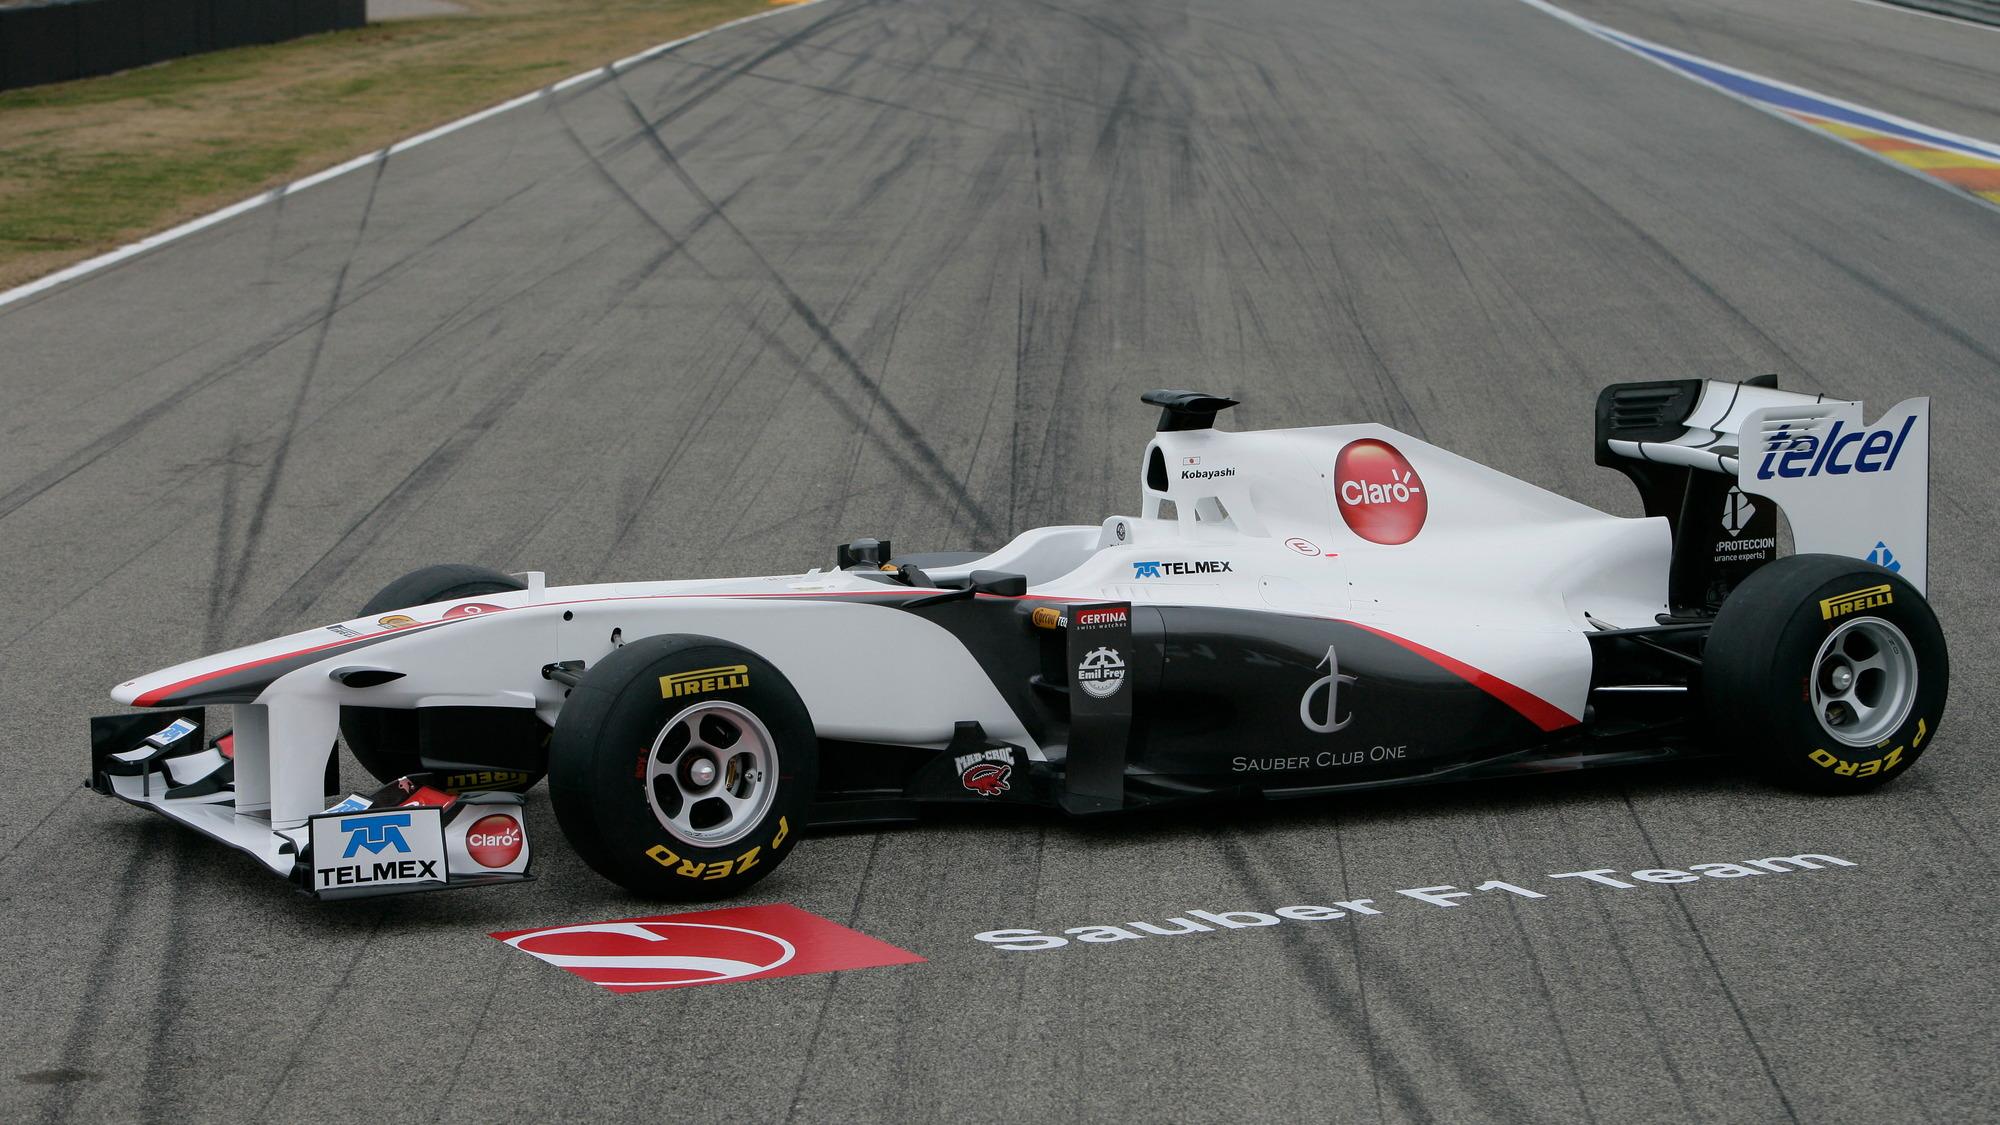 2011 Sauber C30-Ferrari F1 car